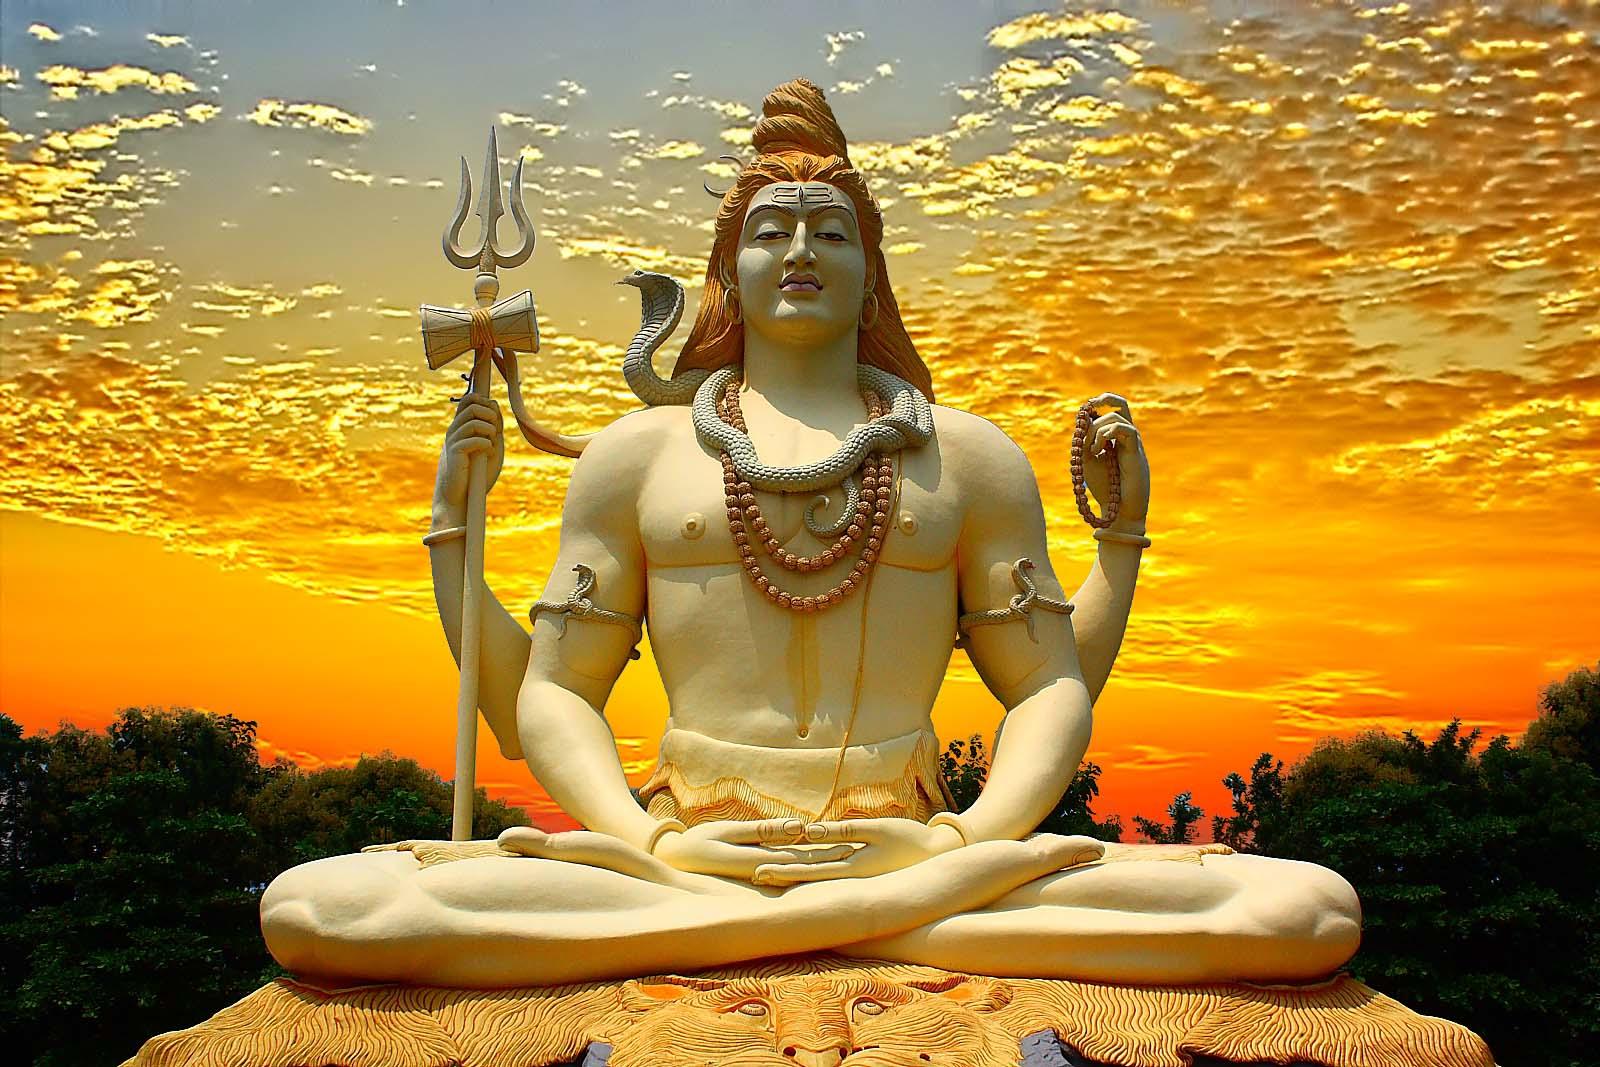 Indian Girl Wallpaper Free Download Lord Shiva Wallpapers Hd Free Download For Desktop Full